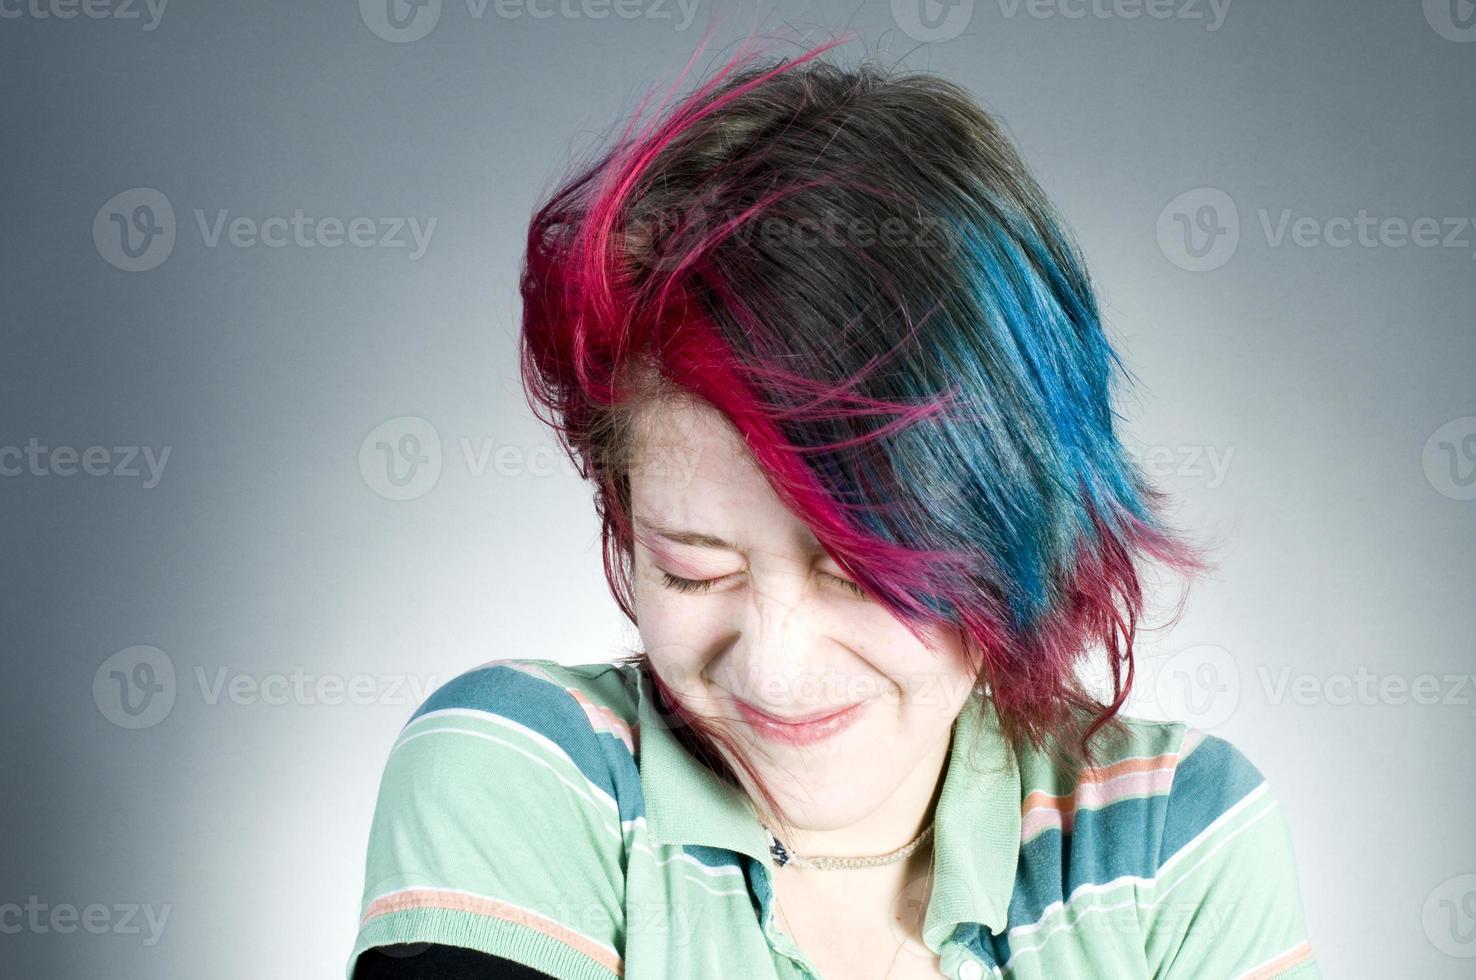 blyg tonåring foto